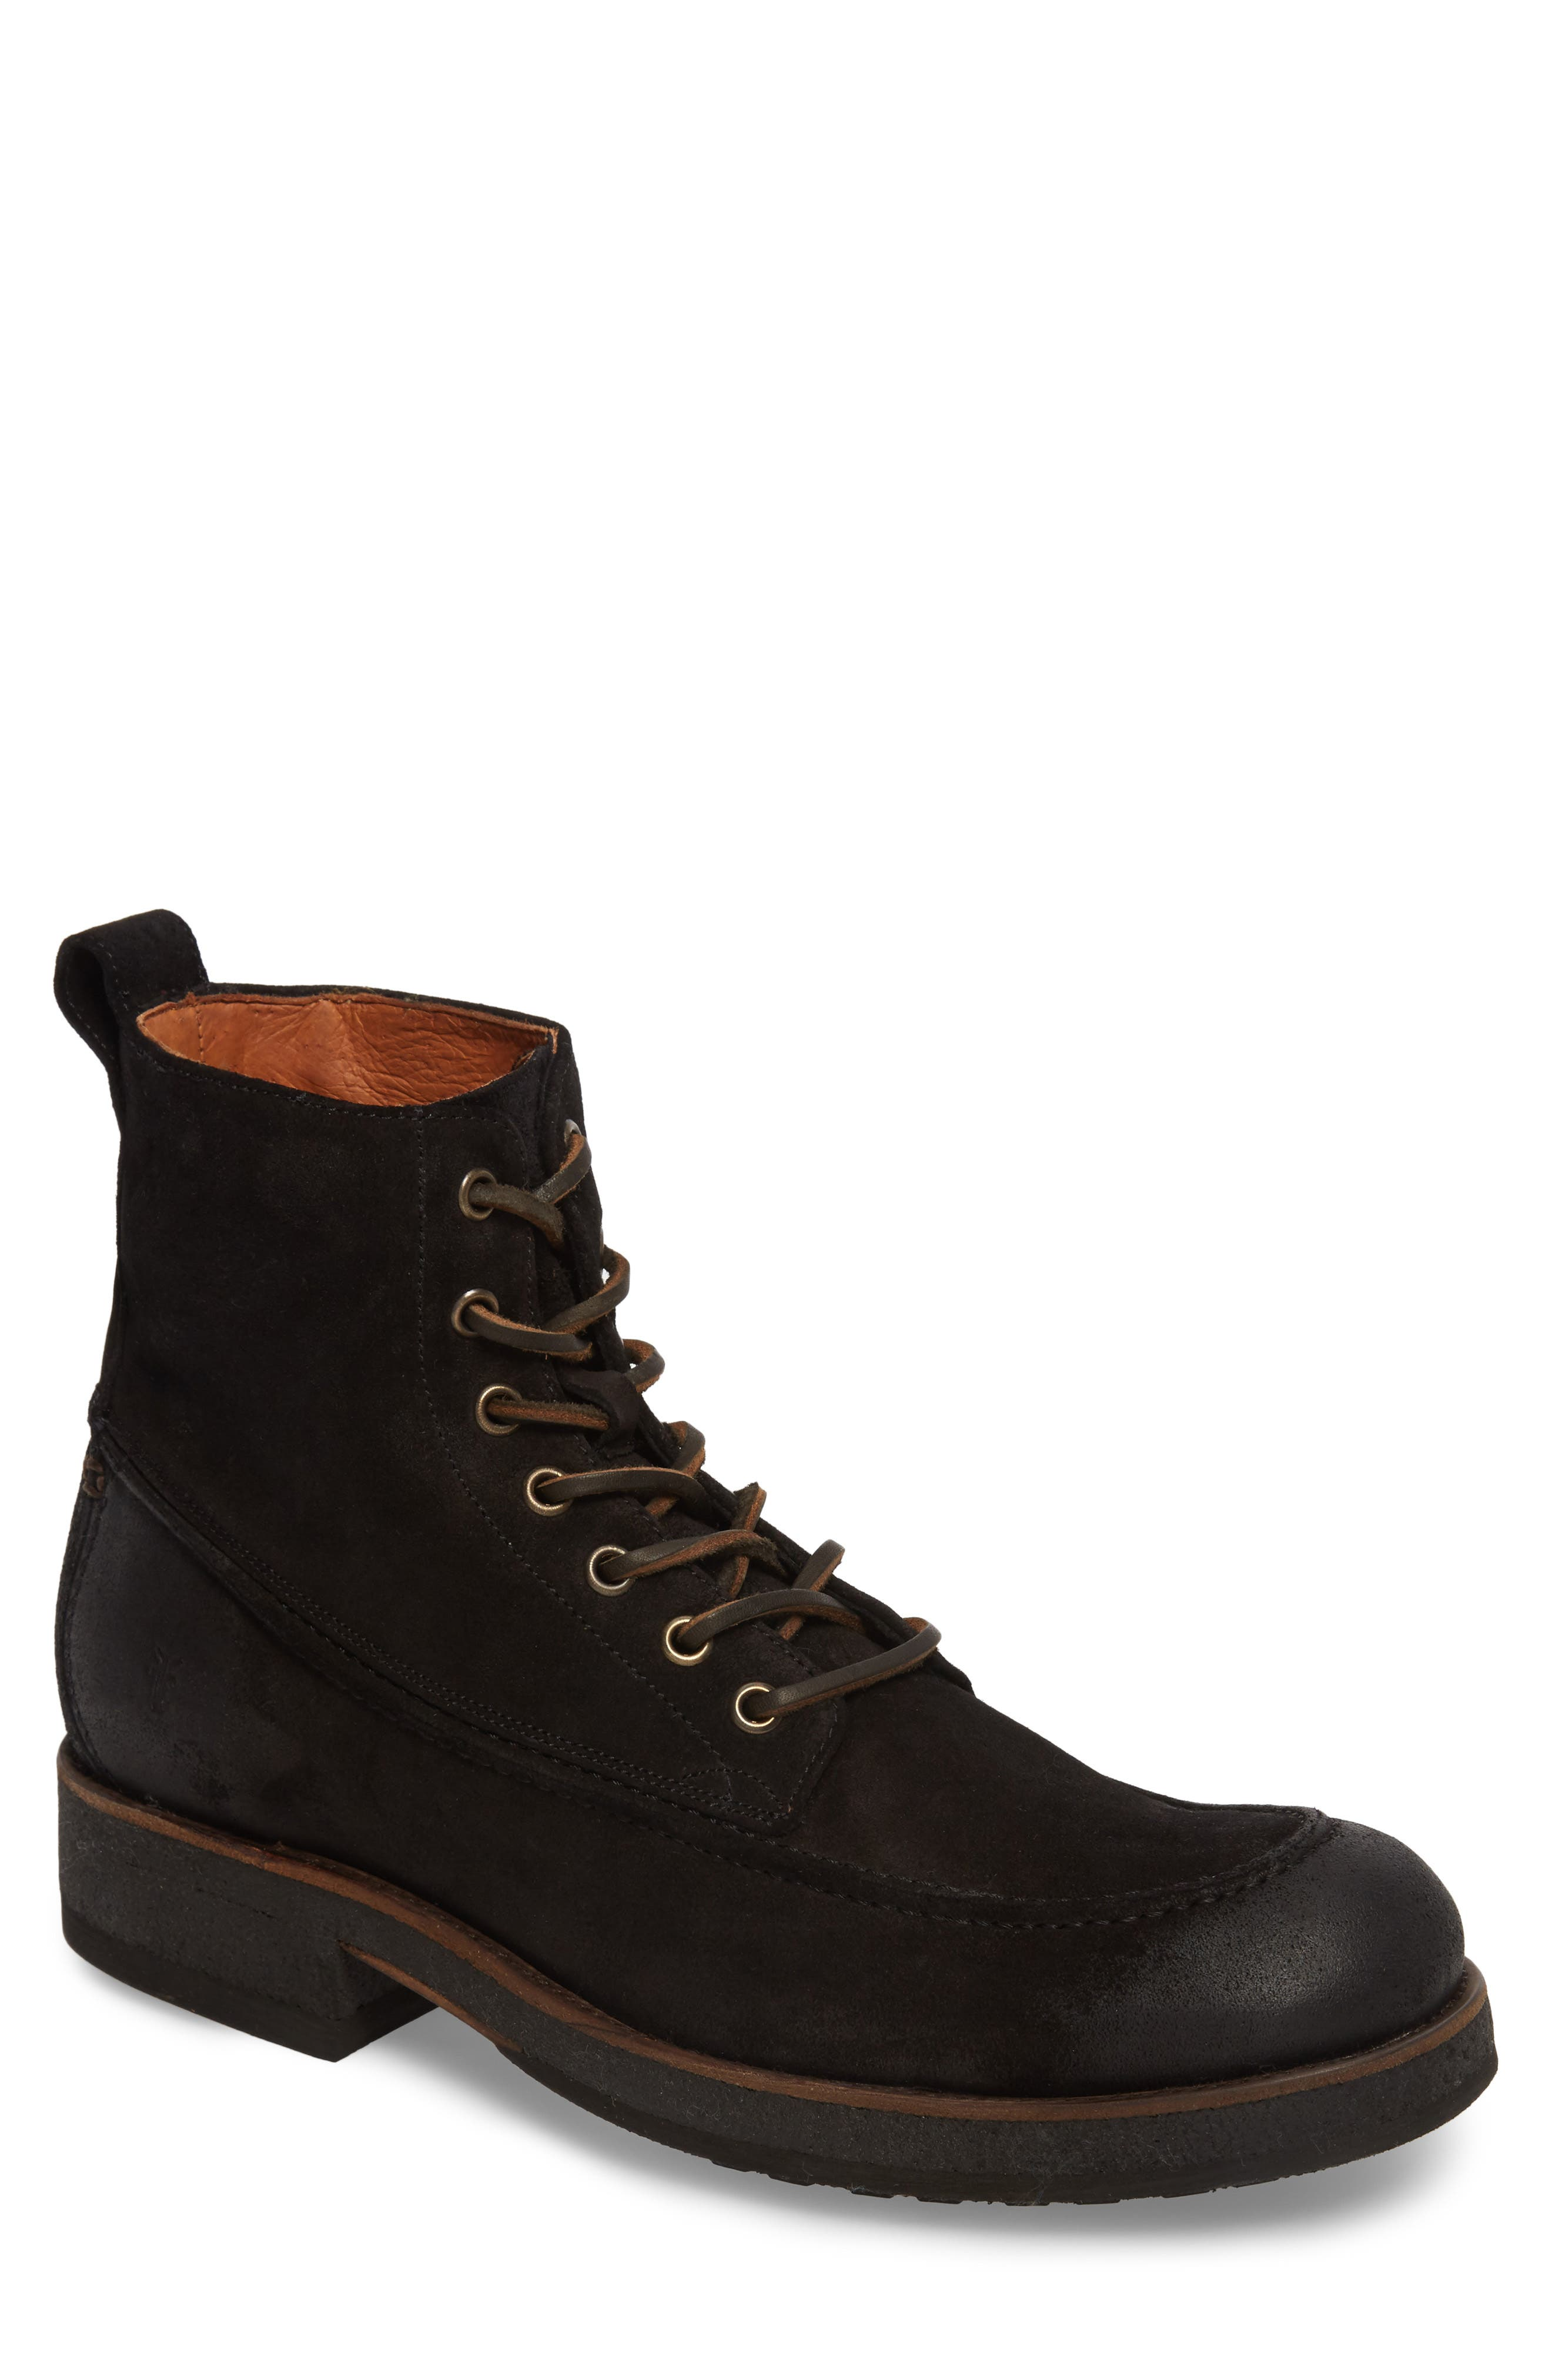 Alternate Image 1 Selected - Frye Rainier Waxed Work Boot (Men)